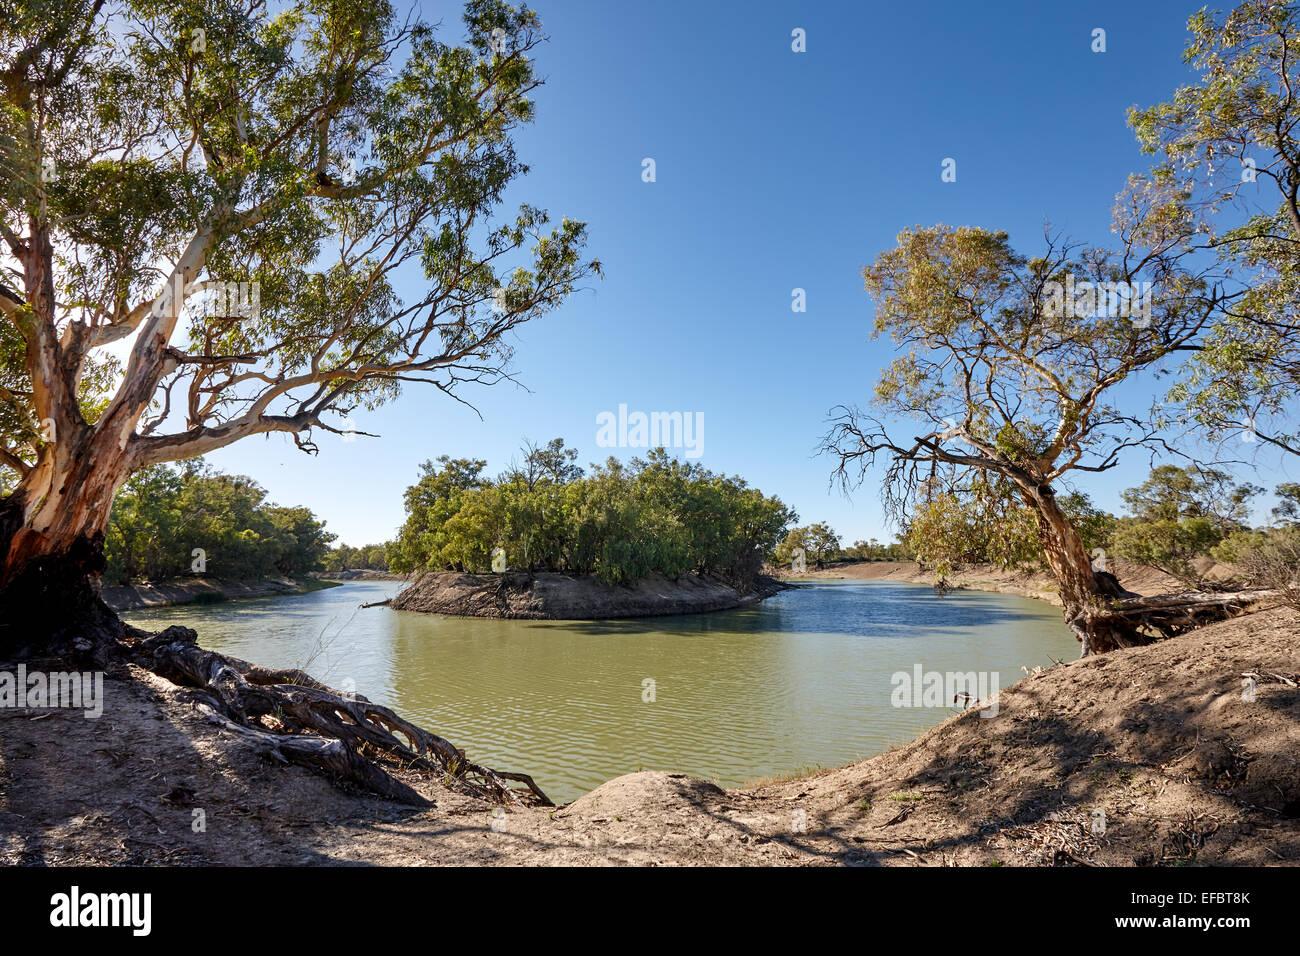 Darling River, Menindee ,New South Wales, Australia. - Stock Image